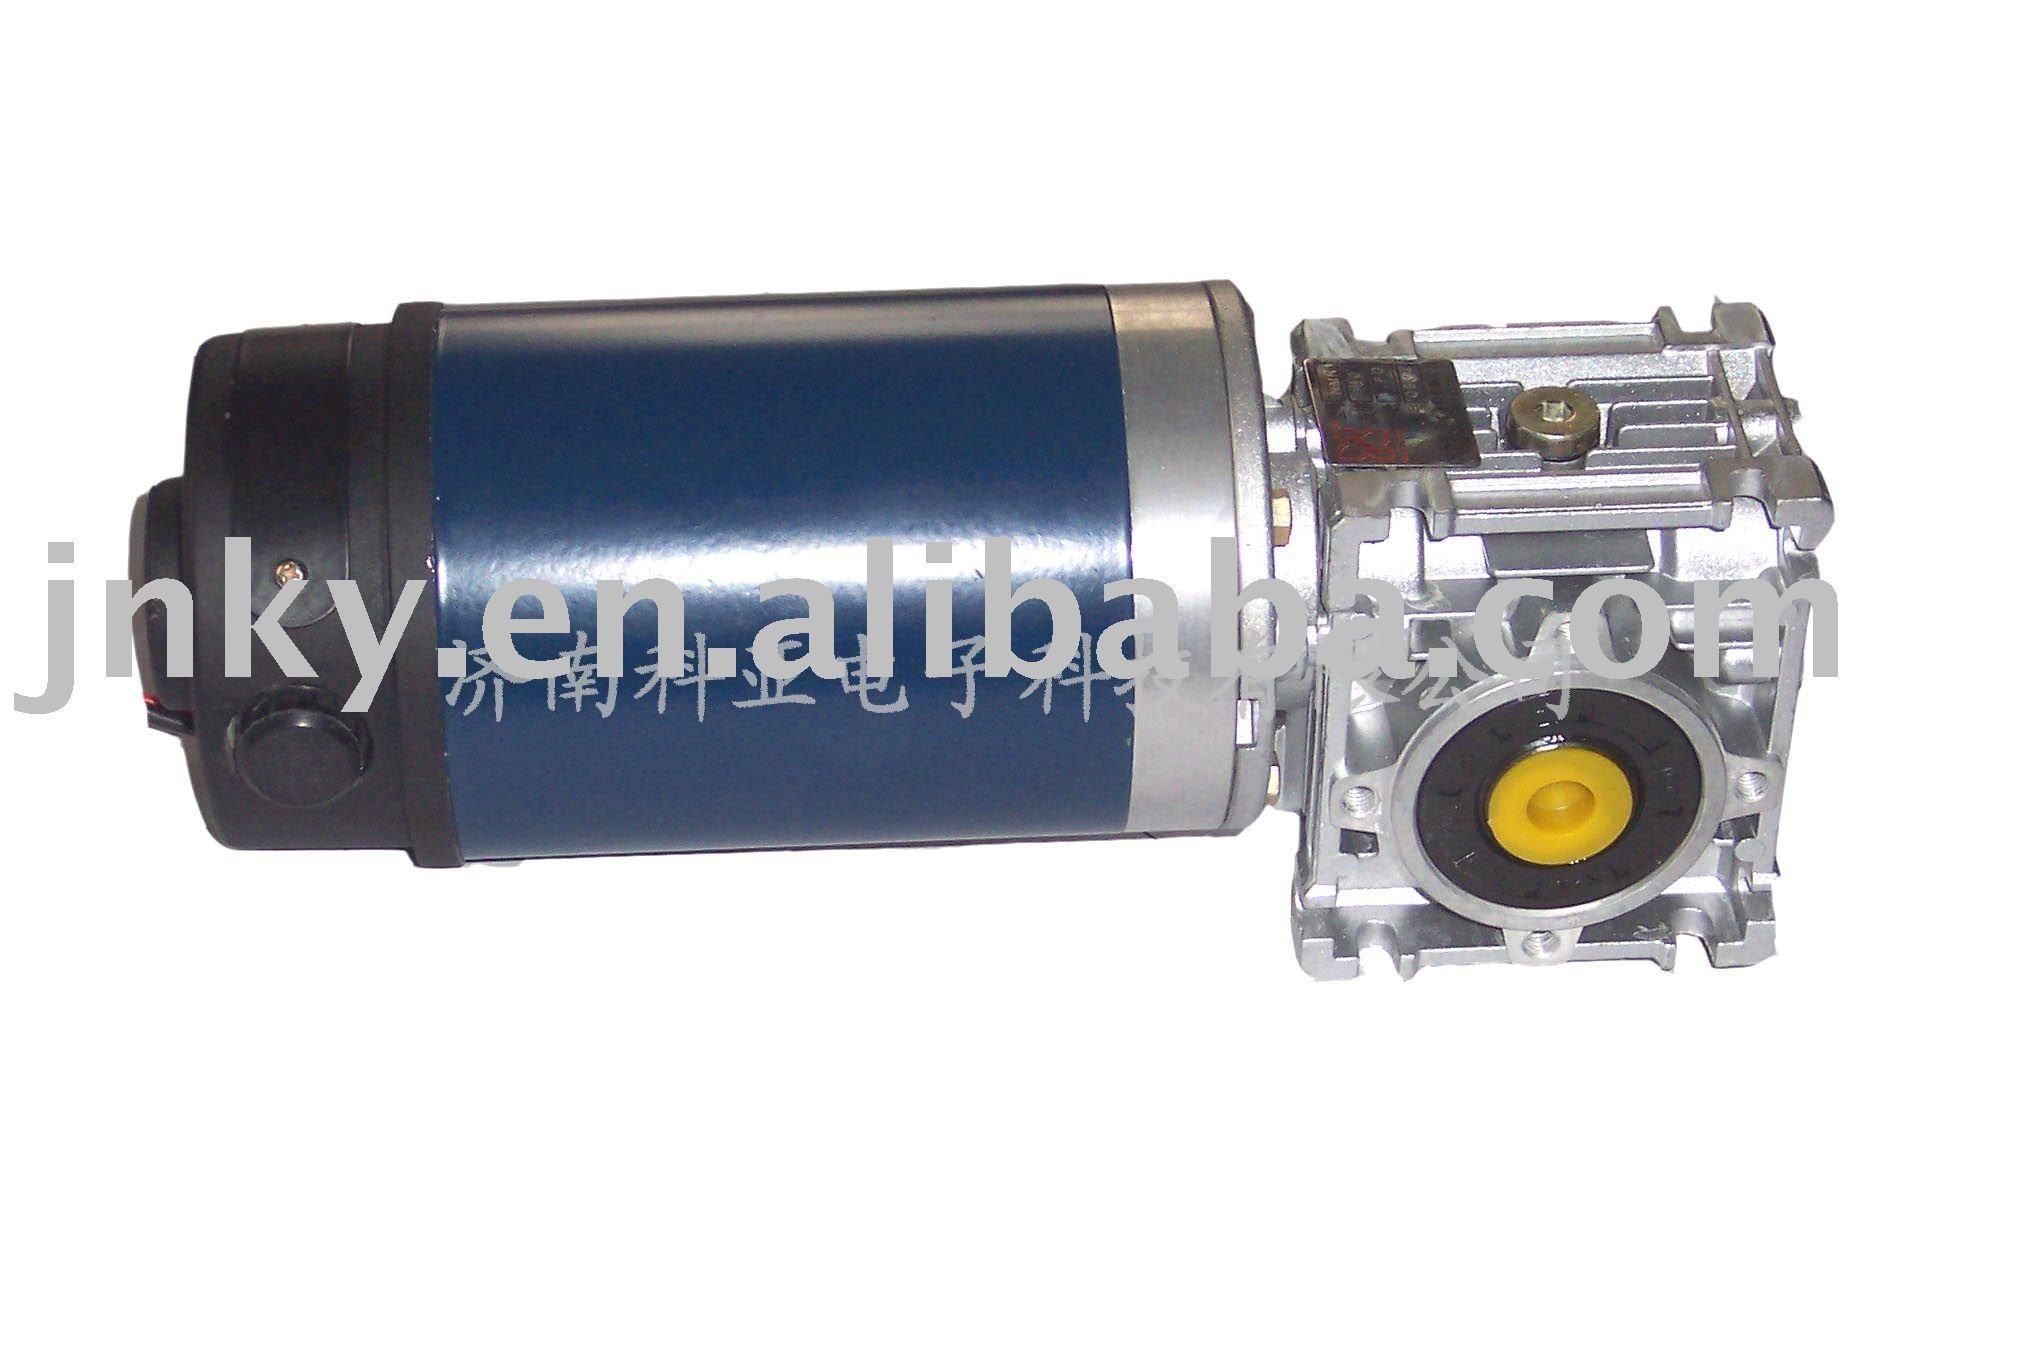 24 v 500 w dc ver motor ducteur moteur dc id de produit for 24 volt servo motor